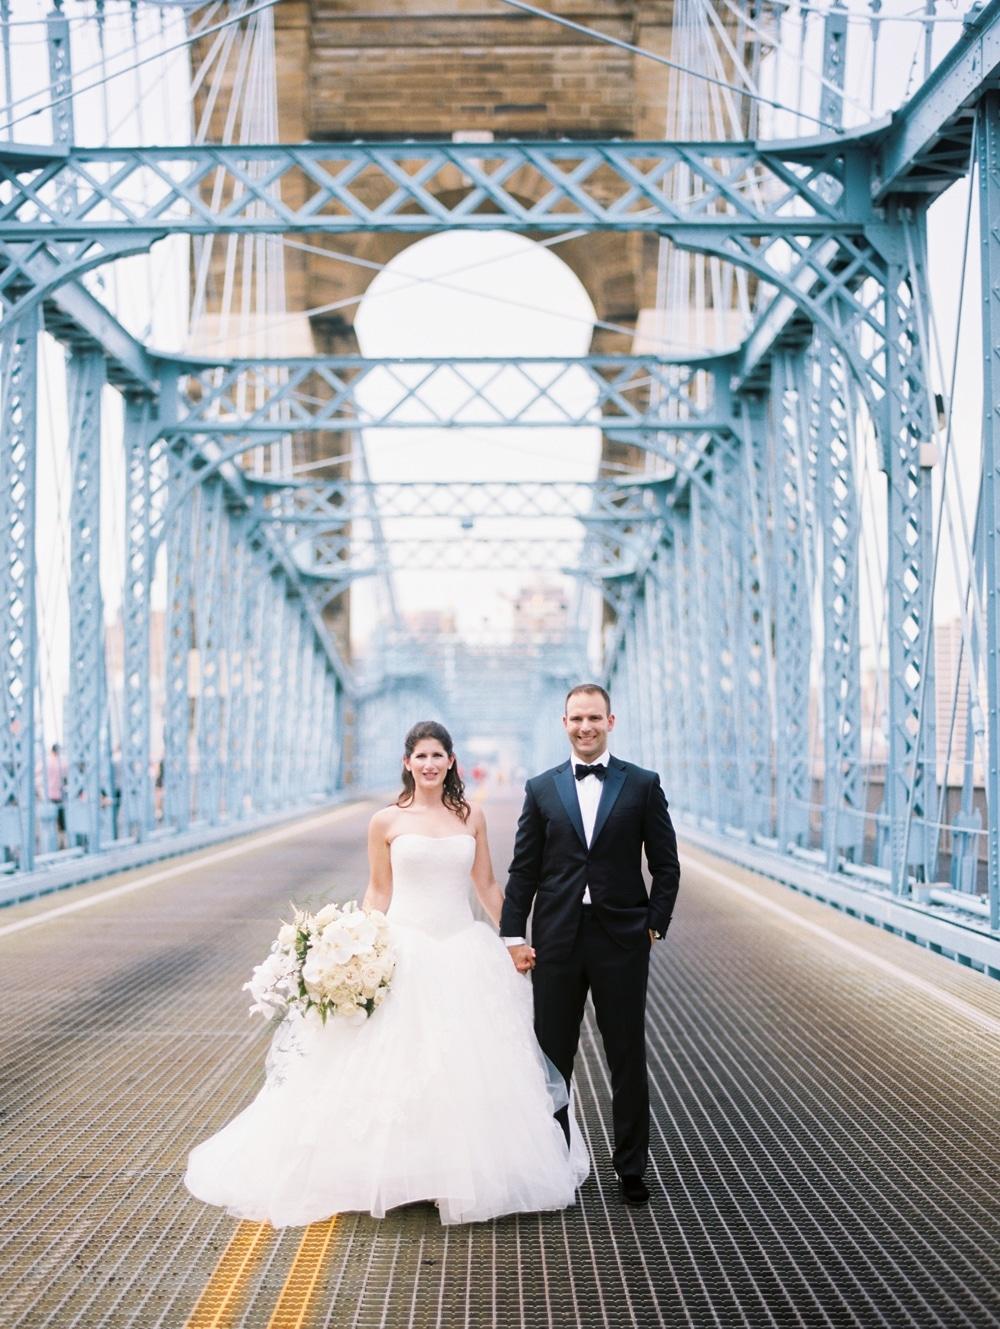 kristin-la-voie-photography-Cincinnati-Music-Hall-Wedding-93